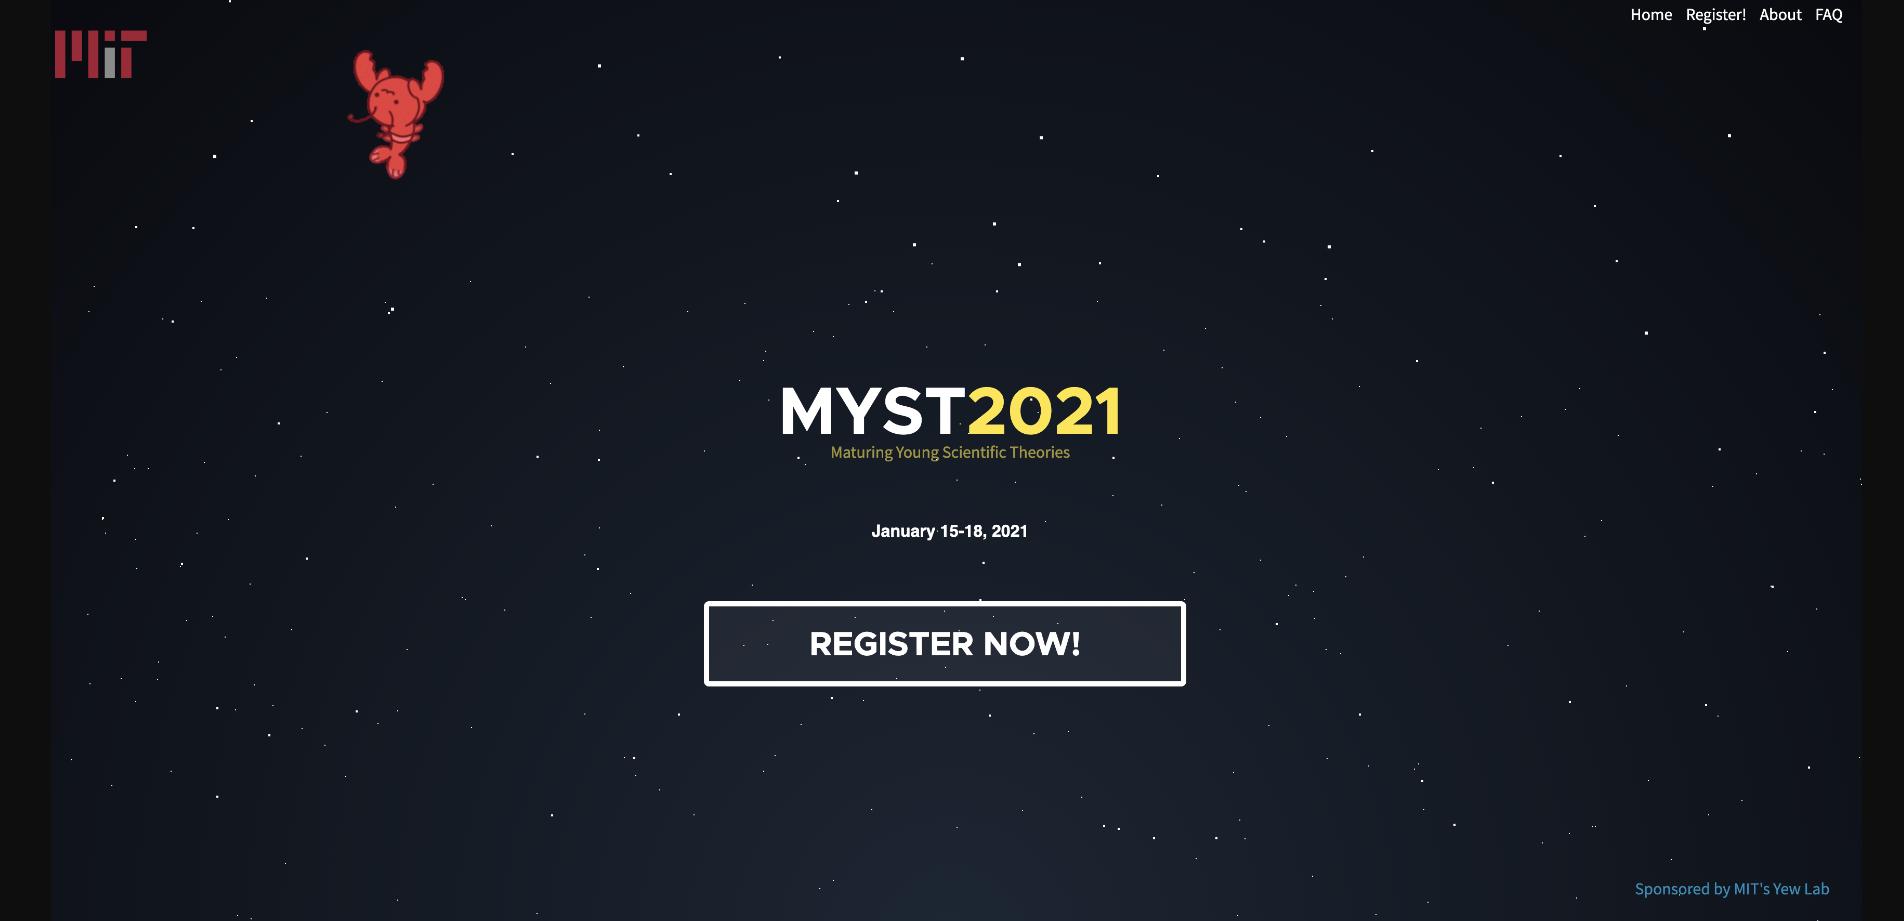 screenshot of registration website with smobster in background